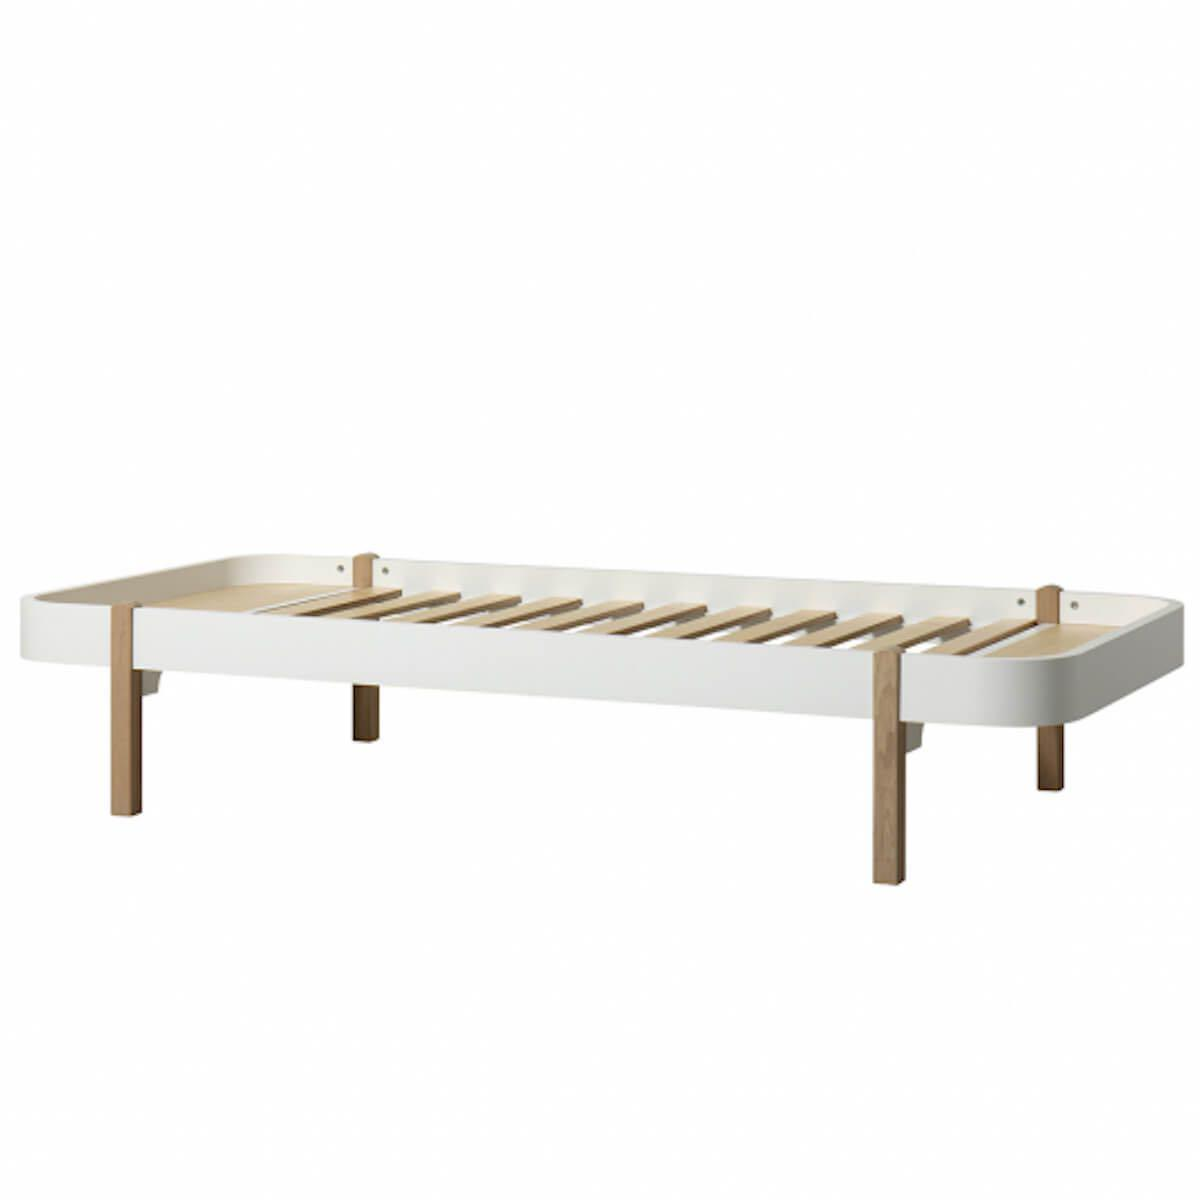 Cama tumbona 90cm WOOD Oliver Furniture blanco-roble